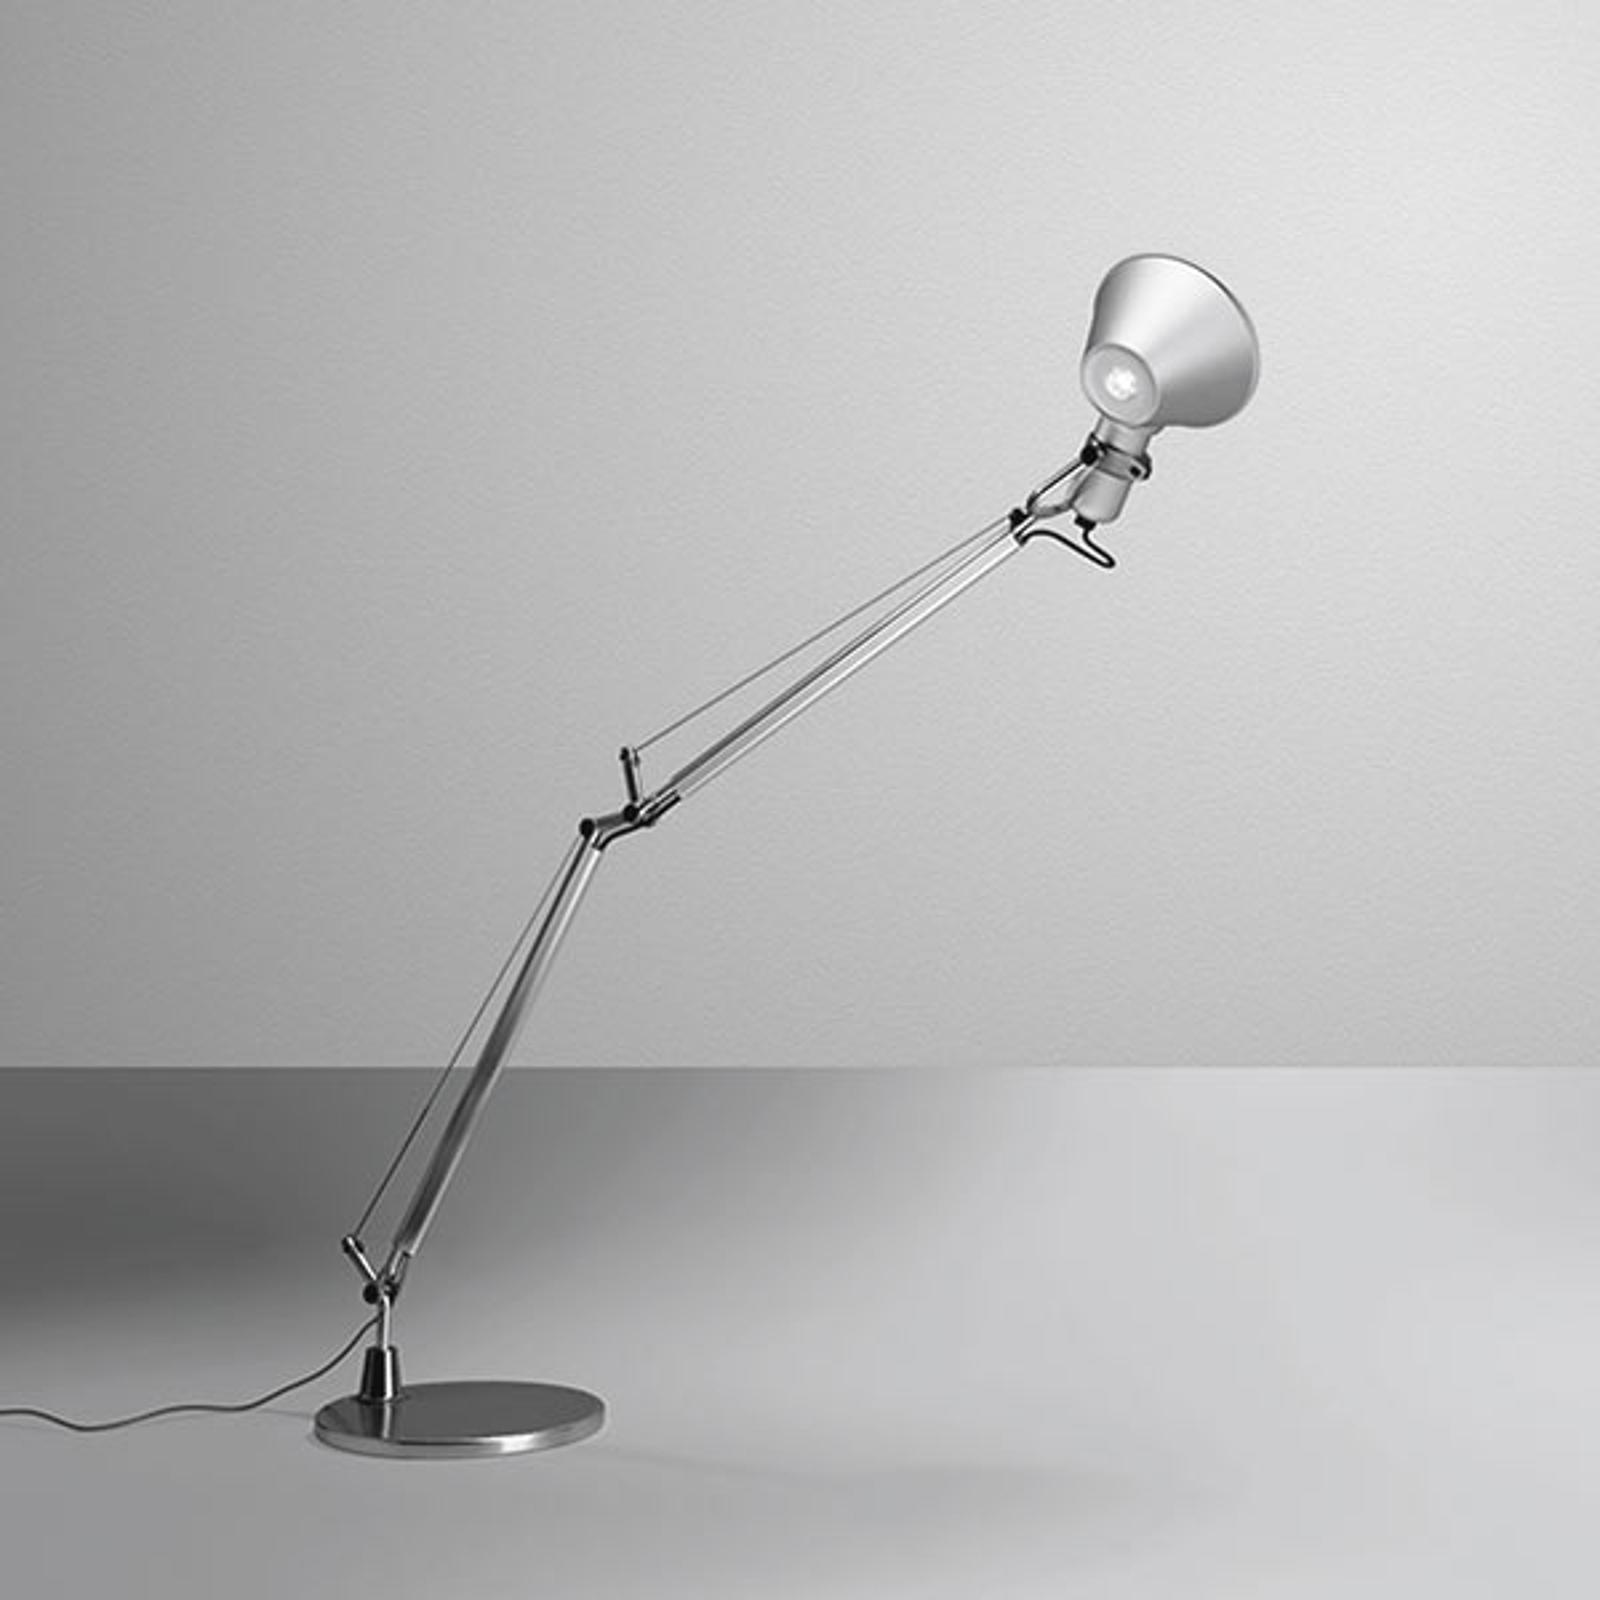 Artemide Tolomeo Midi lampe à poser LED alu 2700K